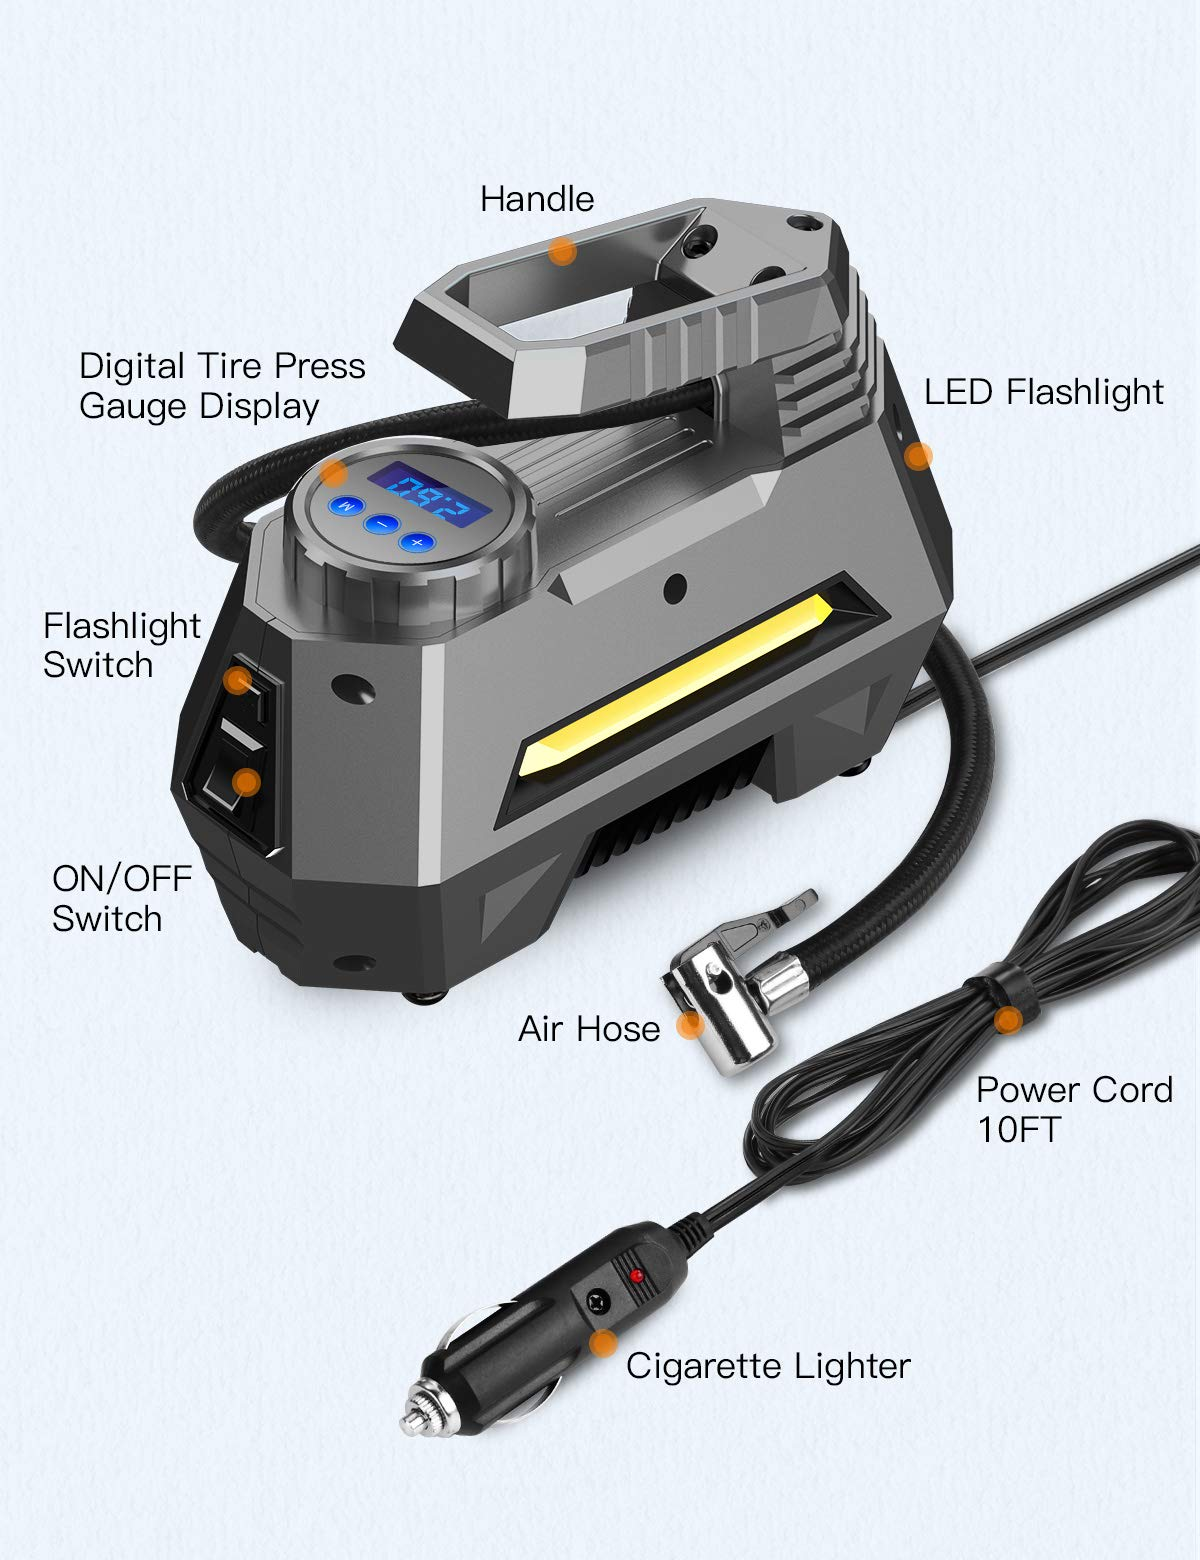 JOYROOM Portable Air Compressor Tire Inflator - Car Tire Pump with Digital Pressure Gauge (150 PSI 12V DC), Bright Emergency Flashlight - for Auto, Trucks, Bicycles, Balls by JOYROOM (Image #5)